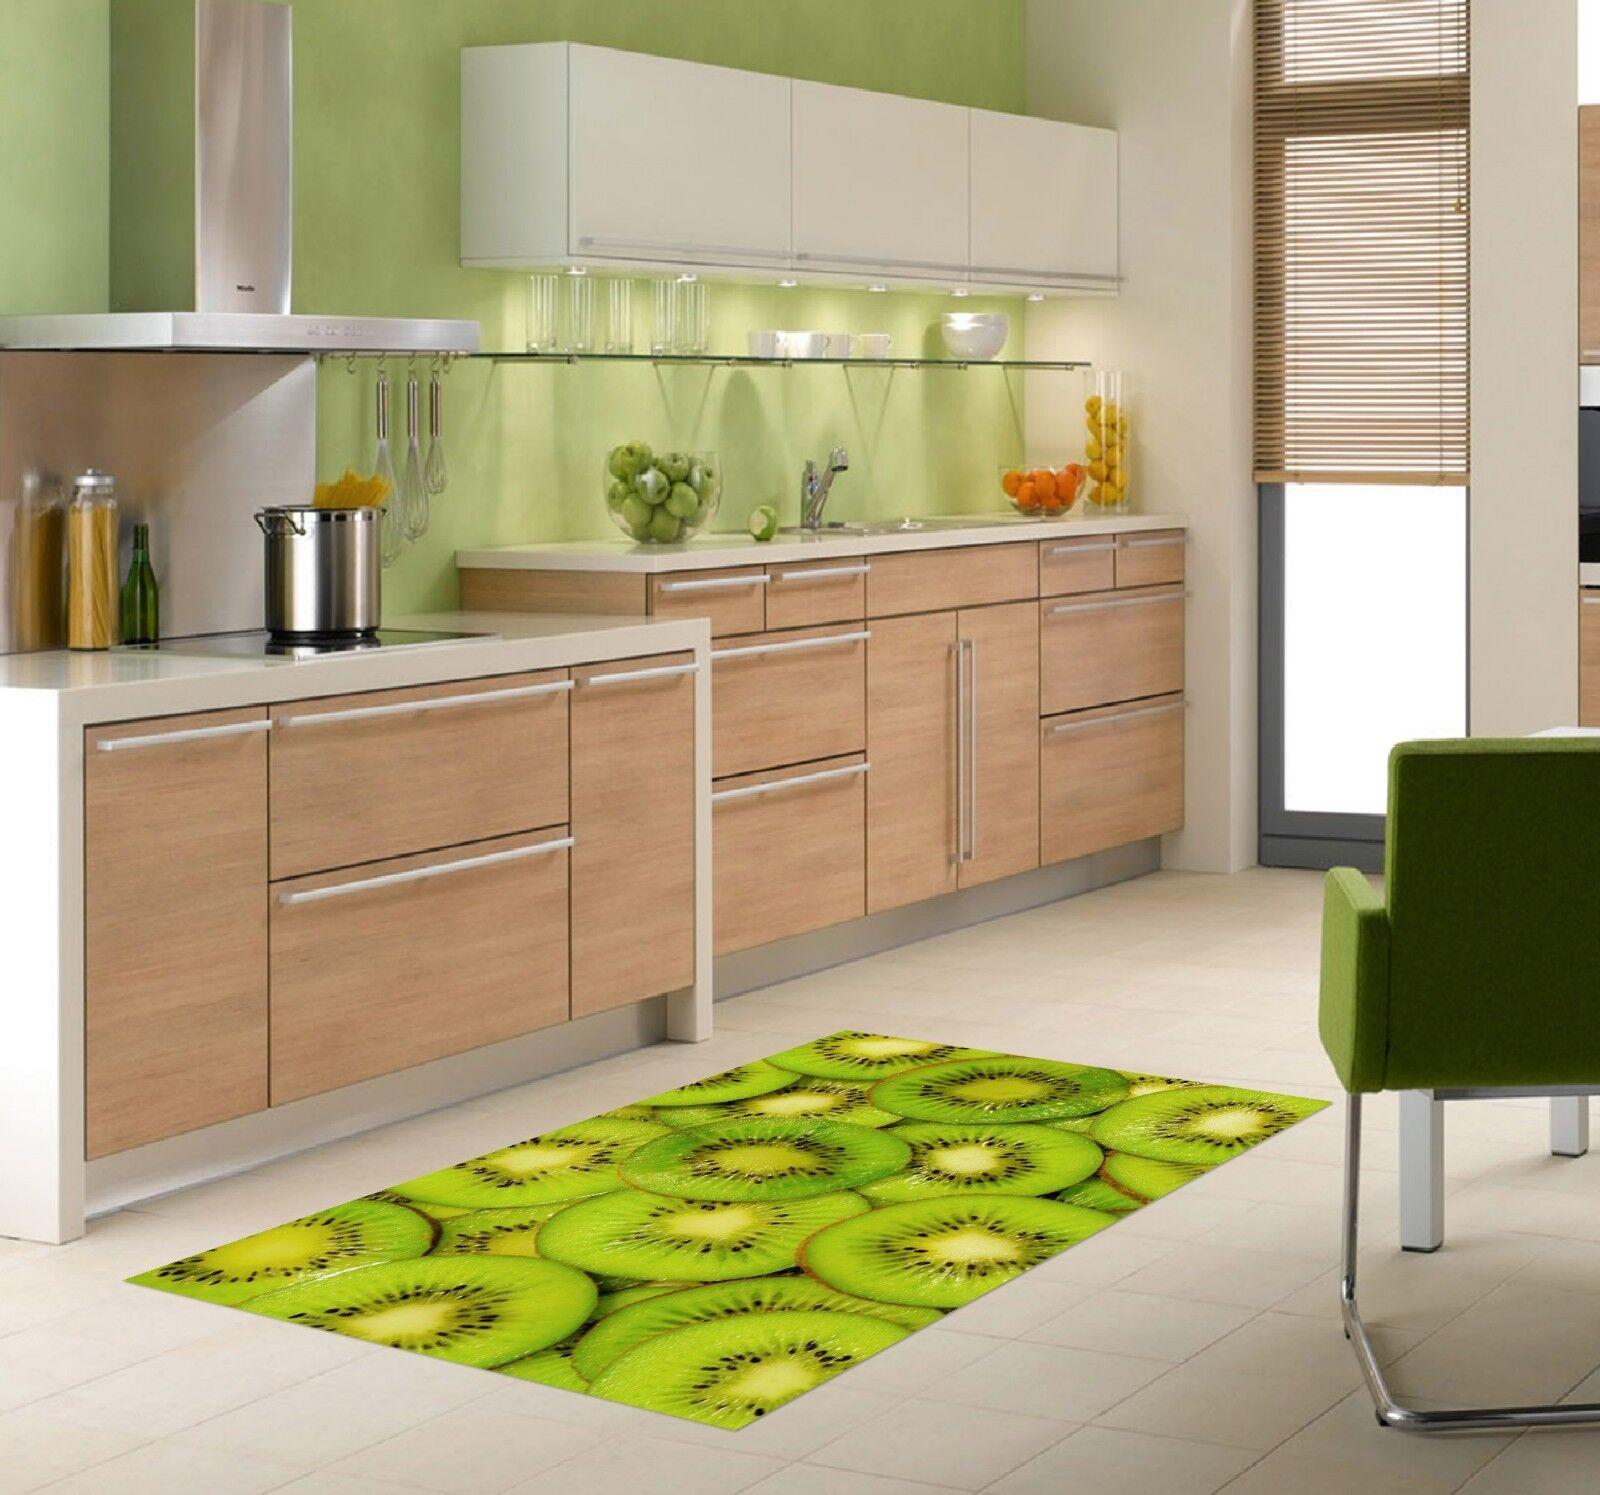 3D Green Kiwi Fruit 89 Kitchen Mat Floor Murals Wall Print Wall Deco UK Carly